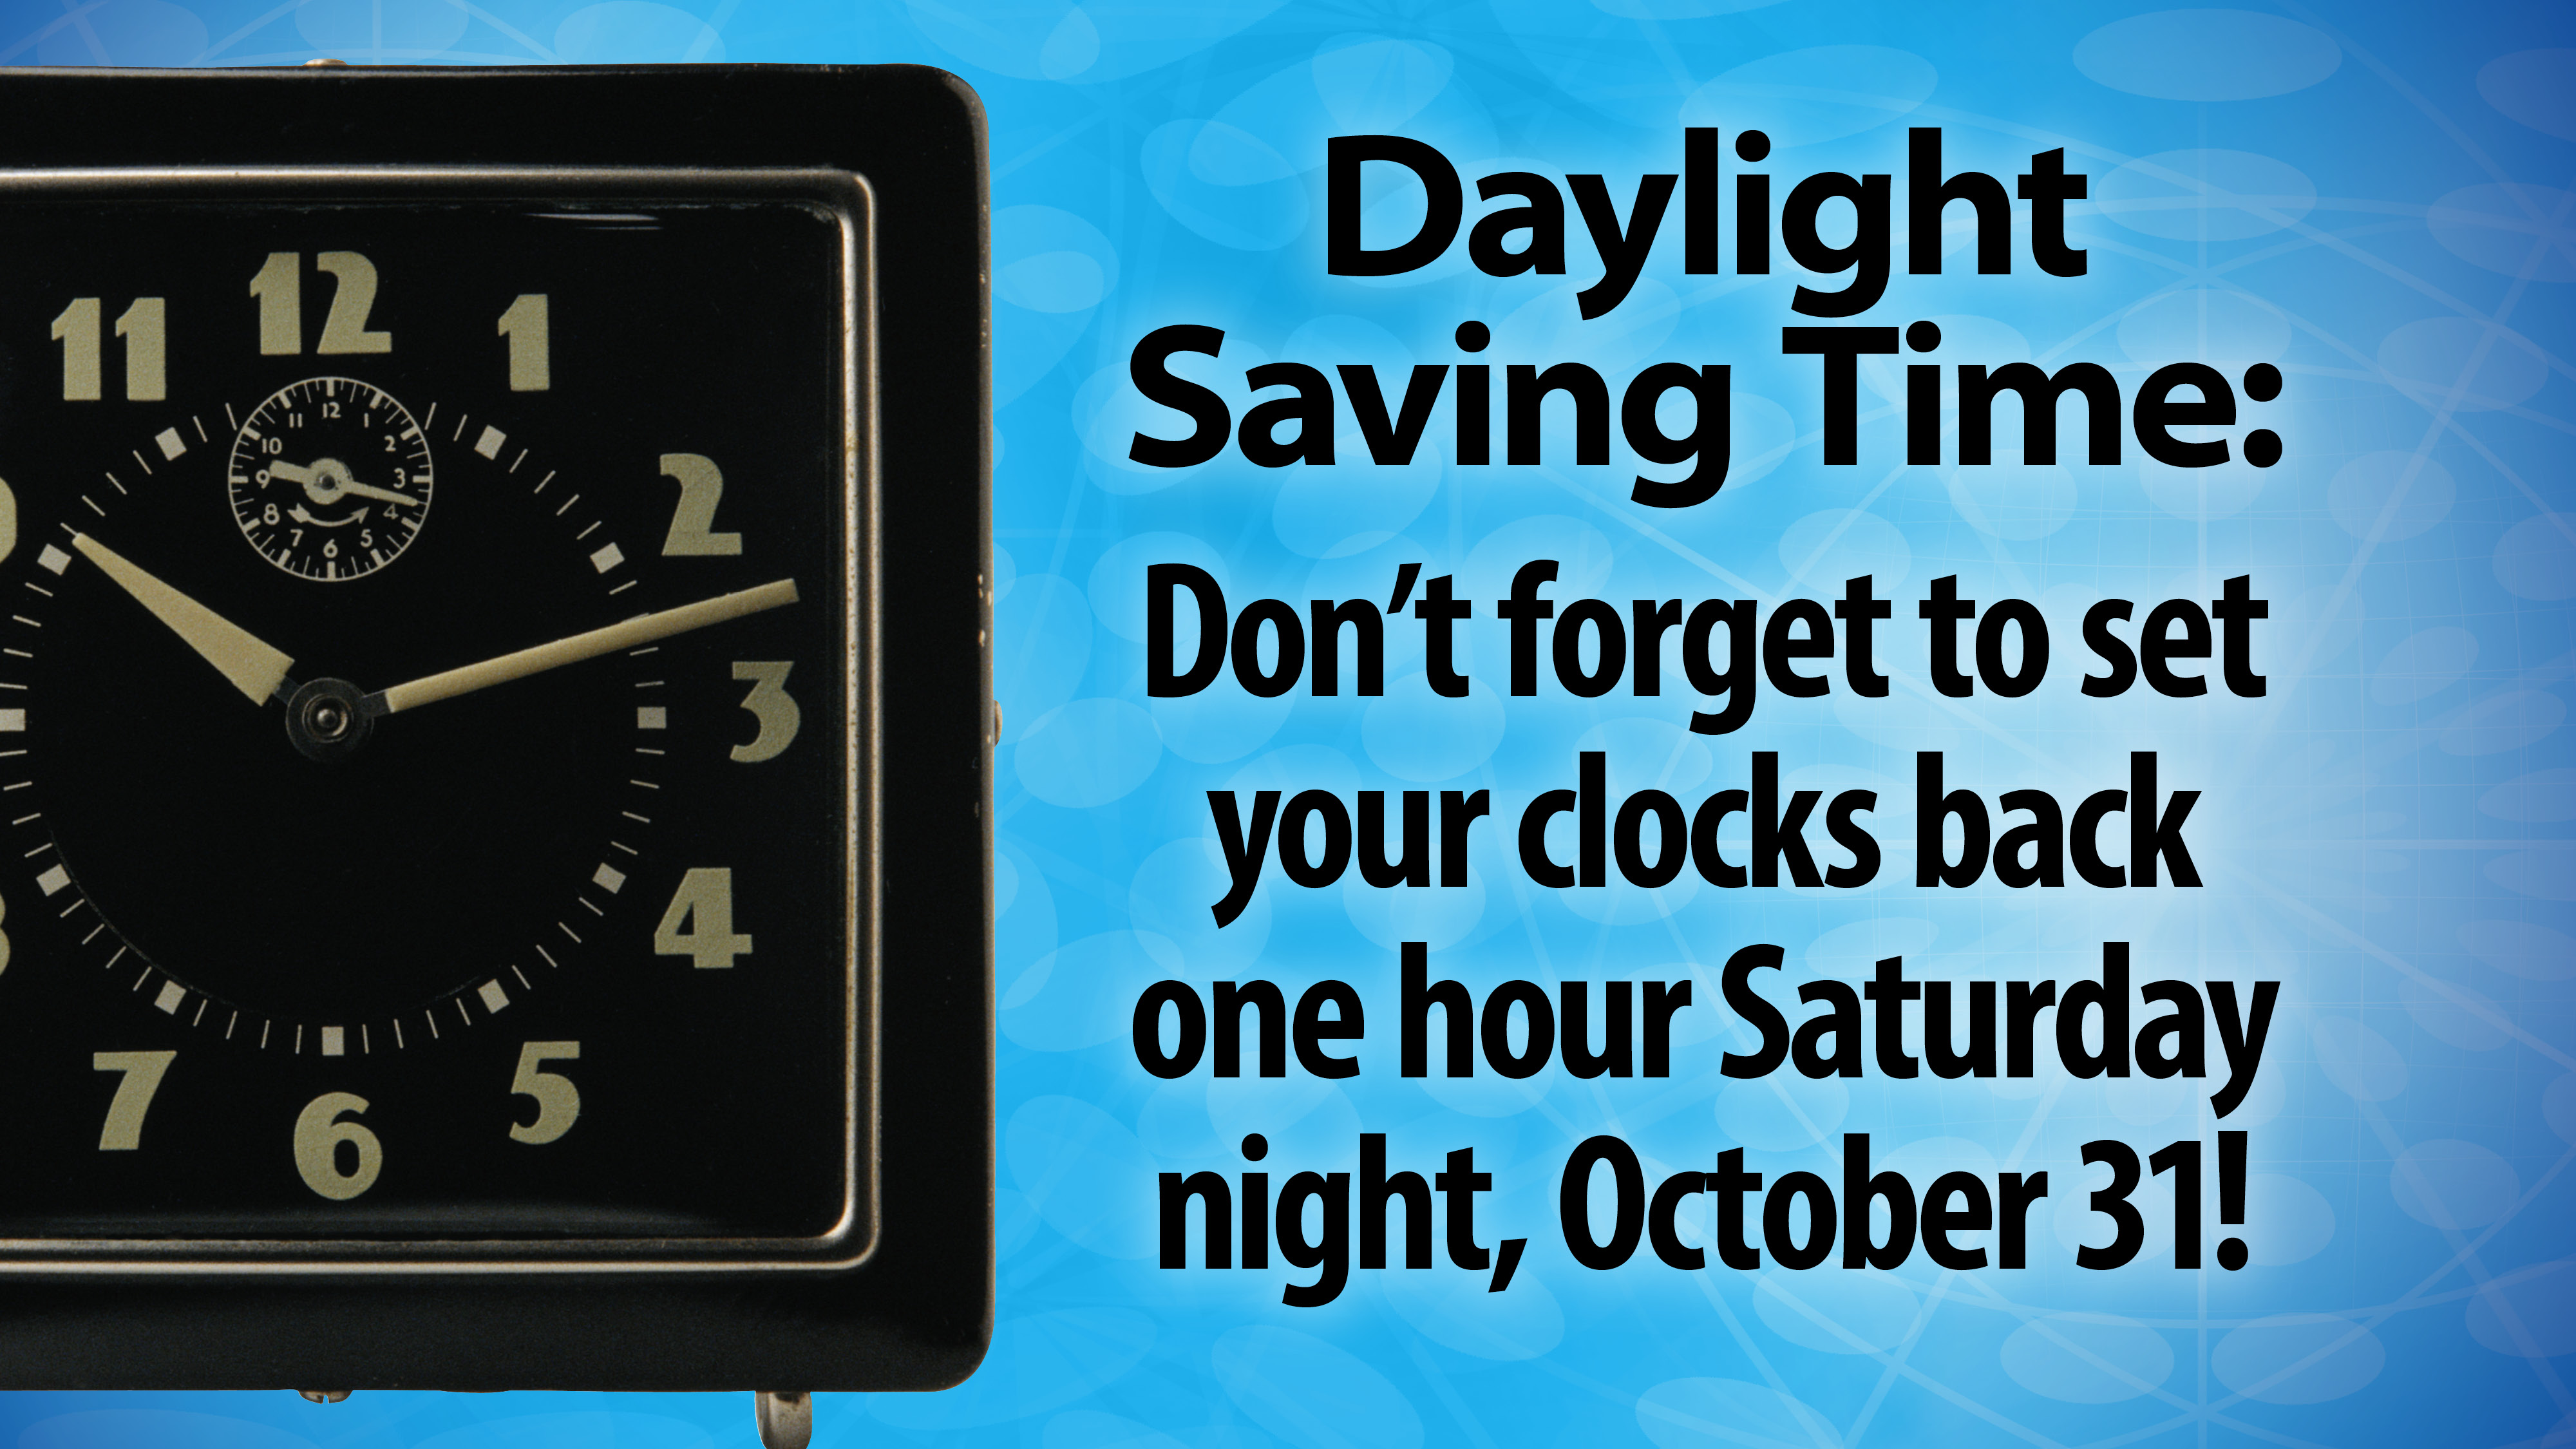 Daylight Saving Time class=